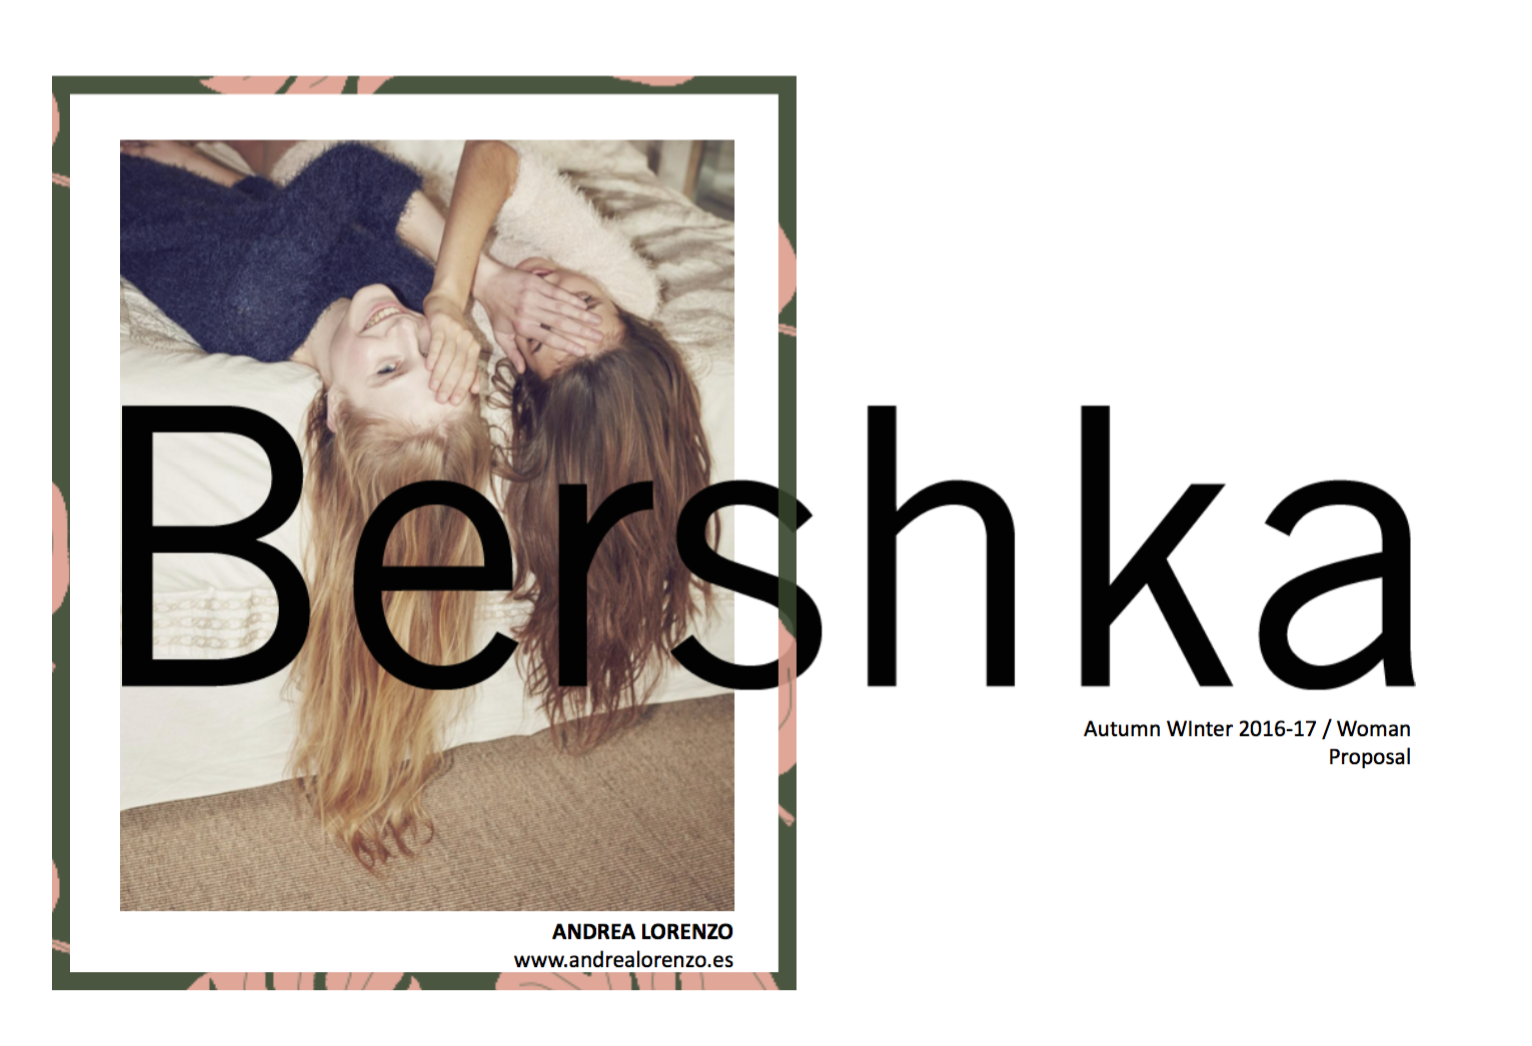 andrealorenzo_Bershka